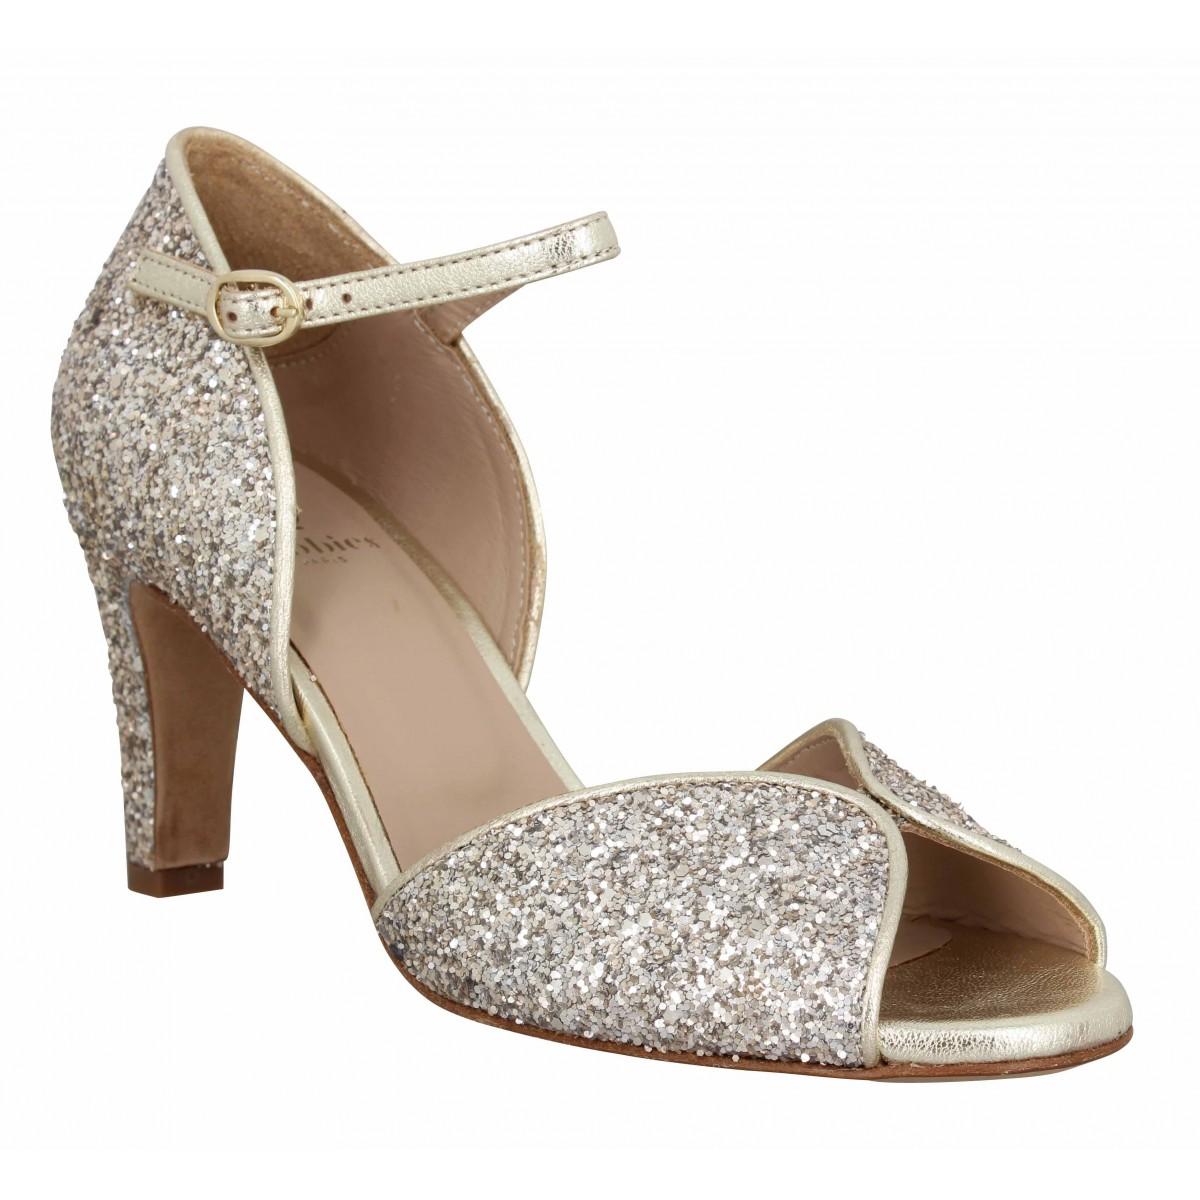 Sandales talons BOBBIES La Swingueuse glitter Femme Dore